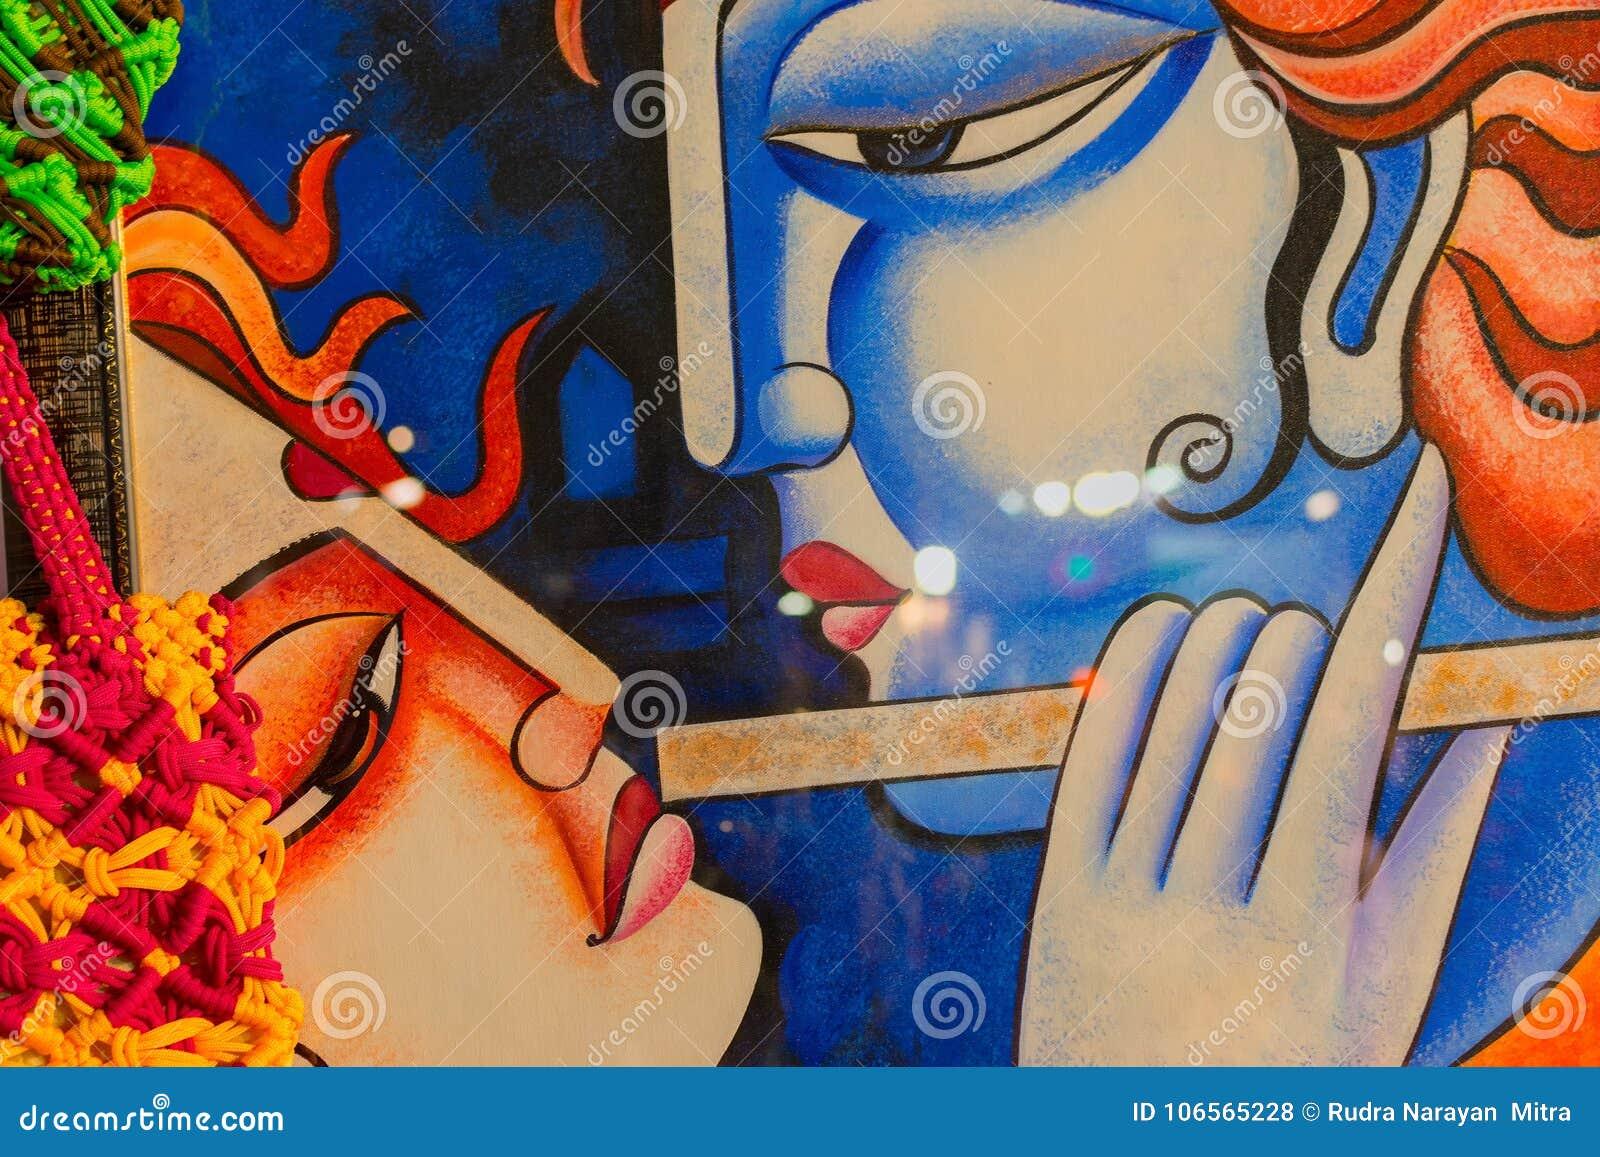 Radha And Krishna Indian Handicrafts Fair At Kolkata Editorial Stock Photo Image Of Handicraft Detail 106565228